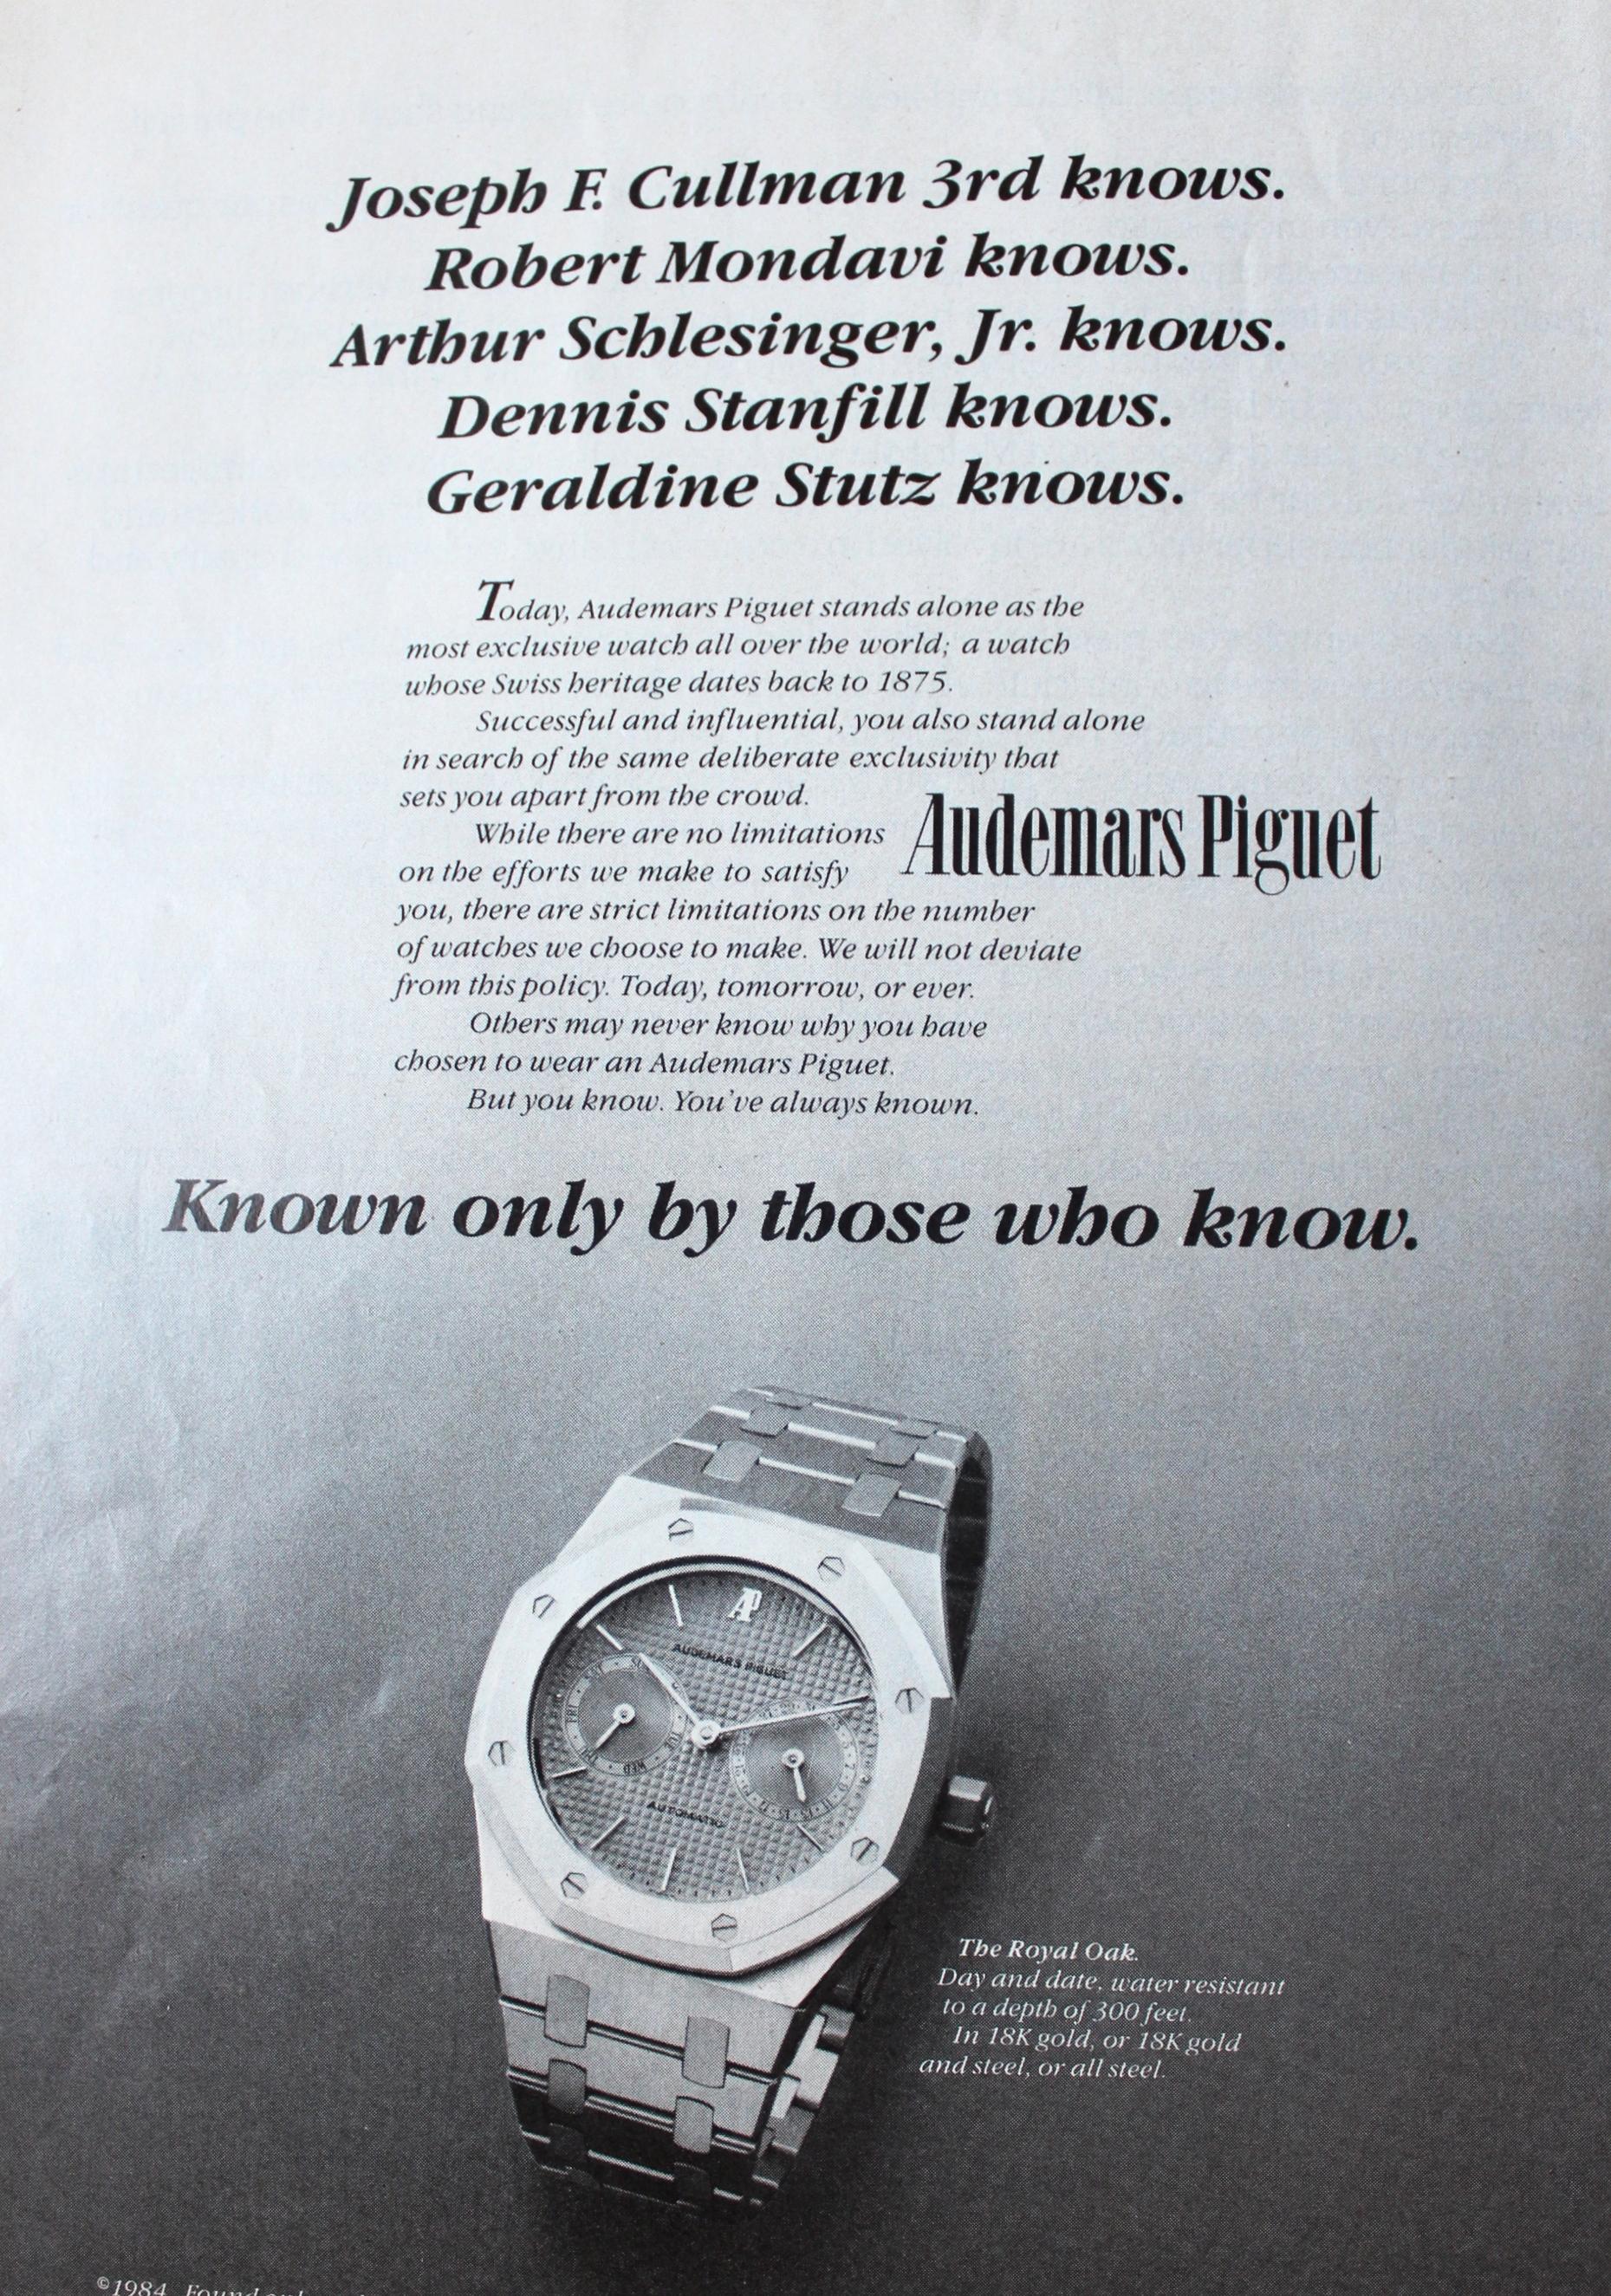 Royal Oak Advertisement circa 1984.